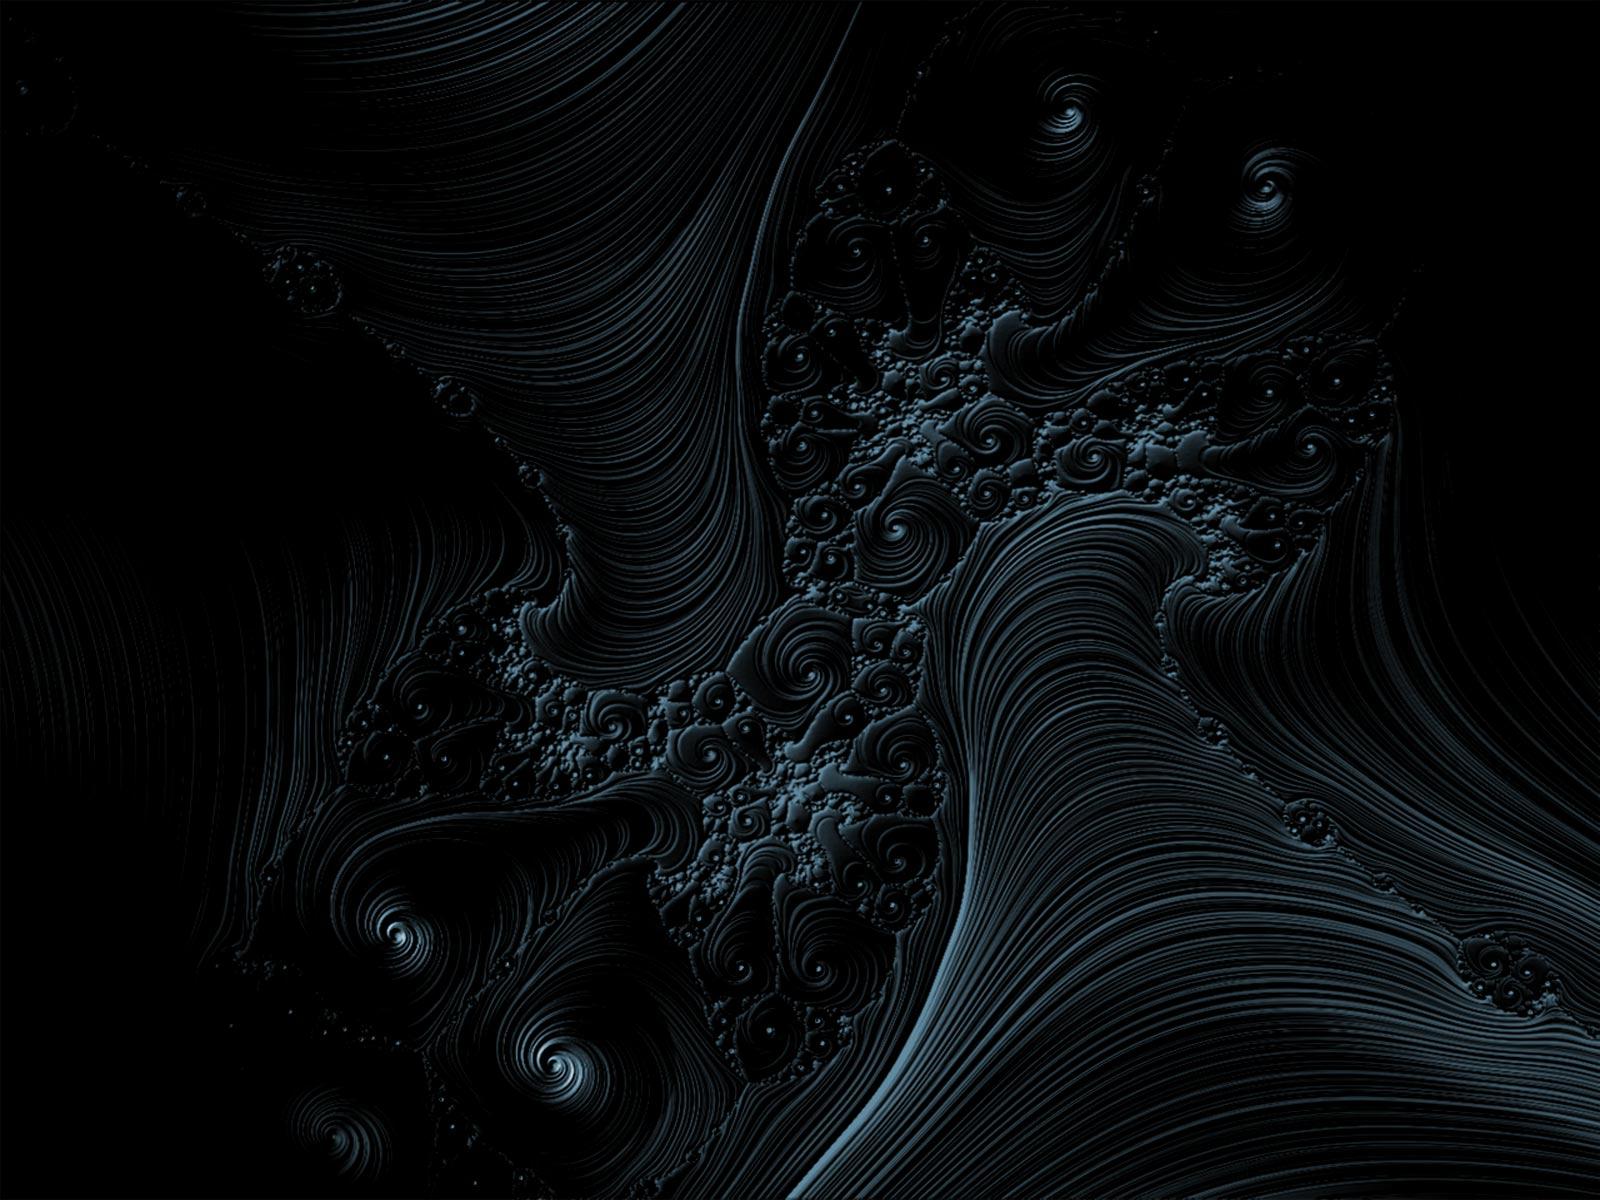 dark backgrounds hd wallpapers pulse